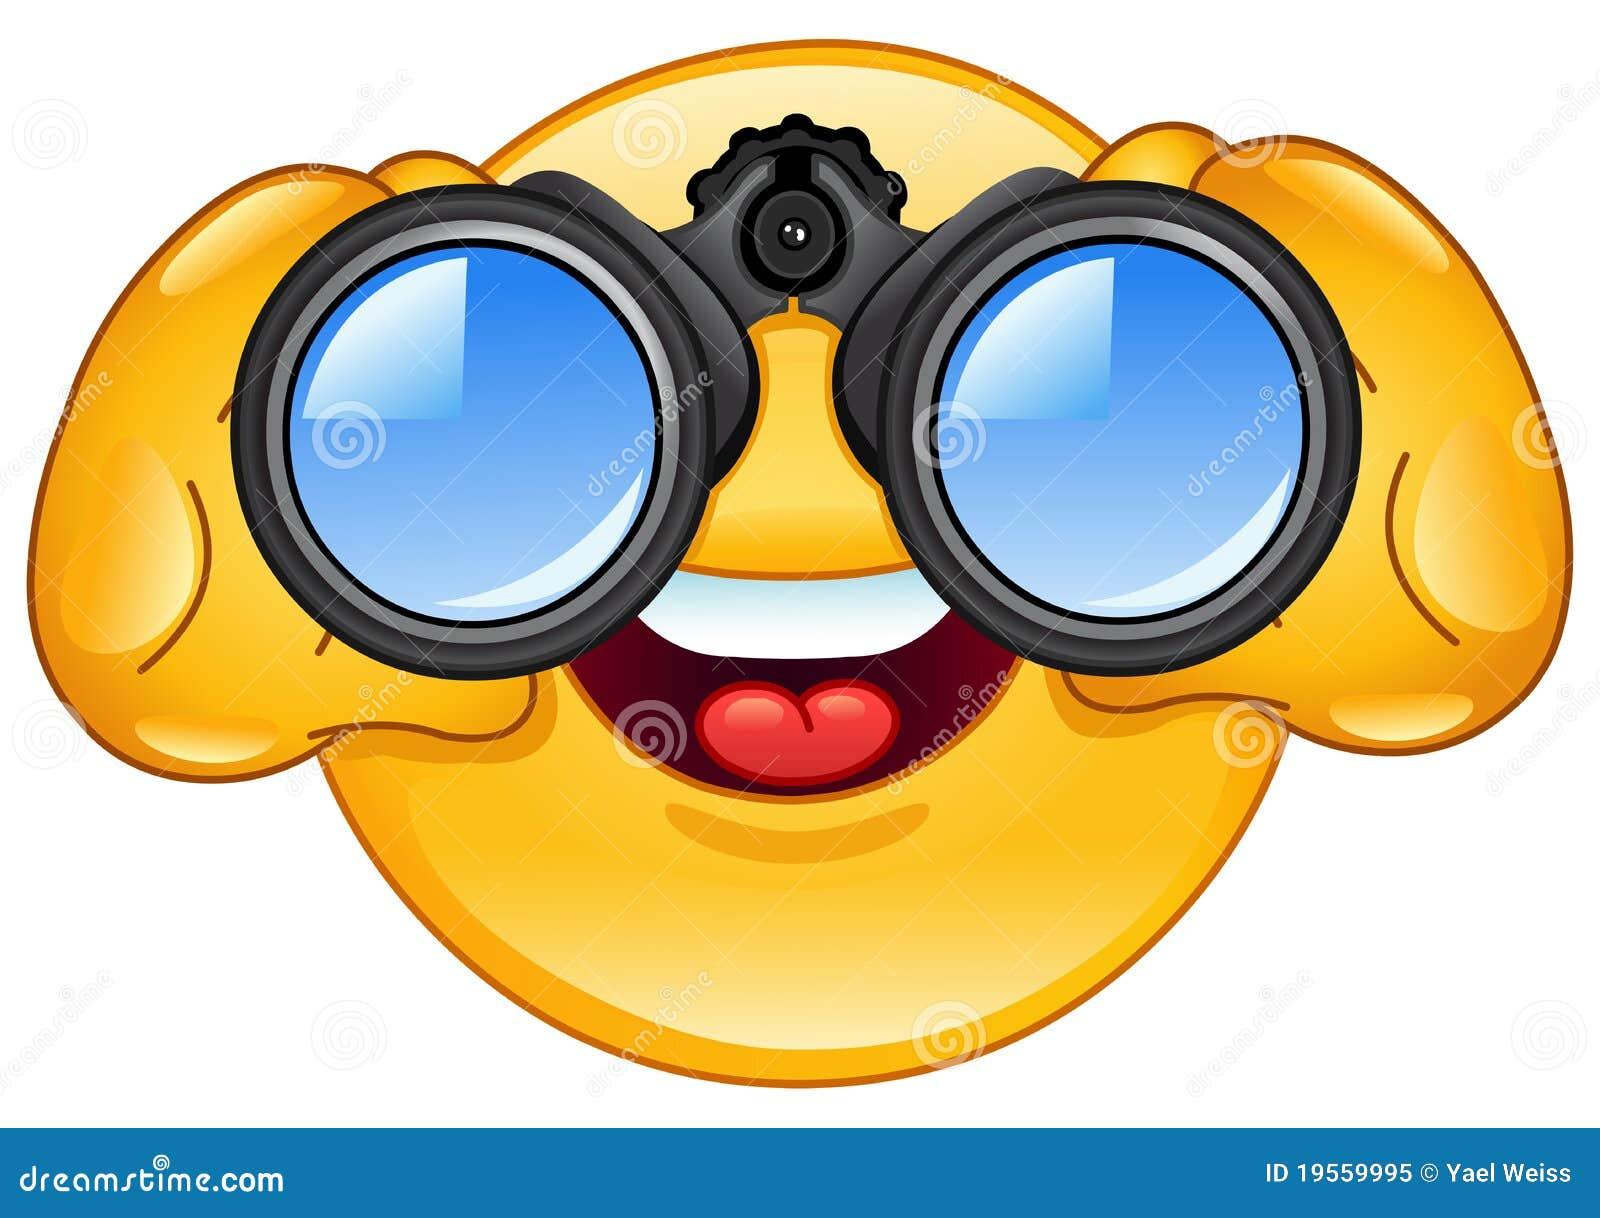 binoculars emoticon royalty free stock photo image 19559995 vector 21 binoculars vector binoculars price